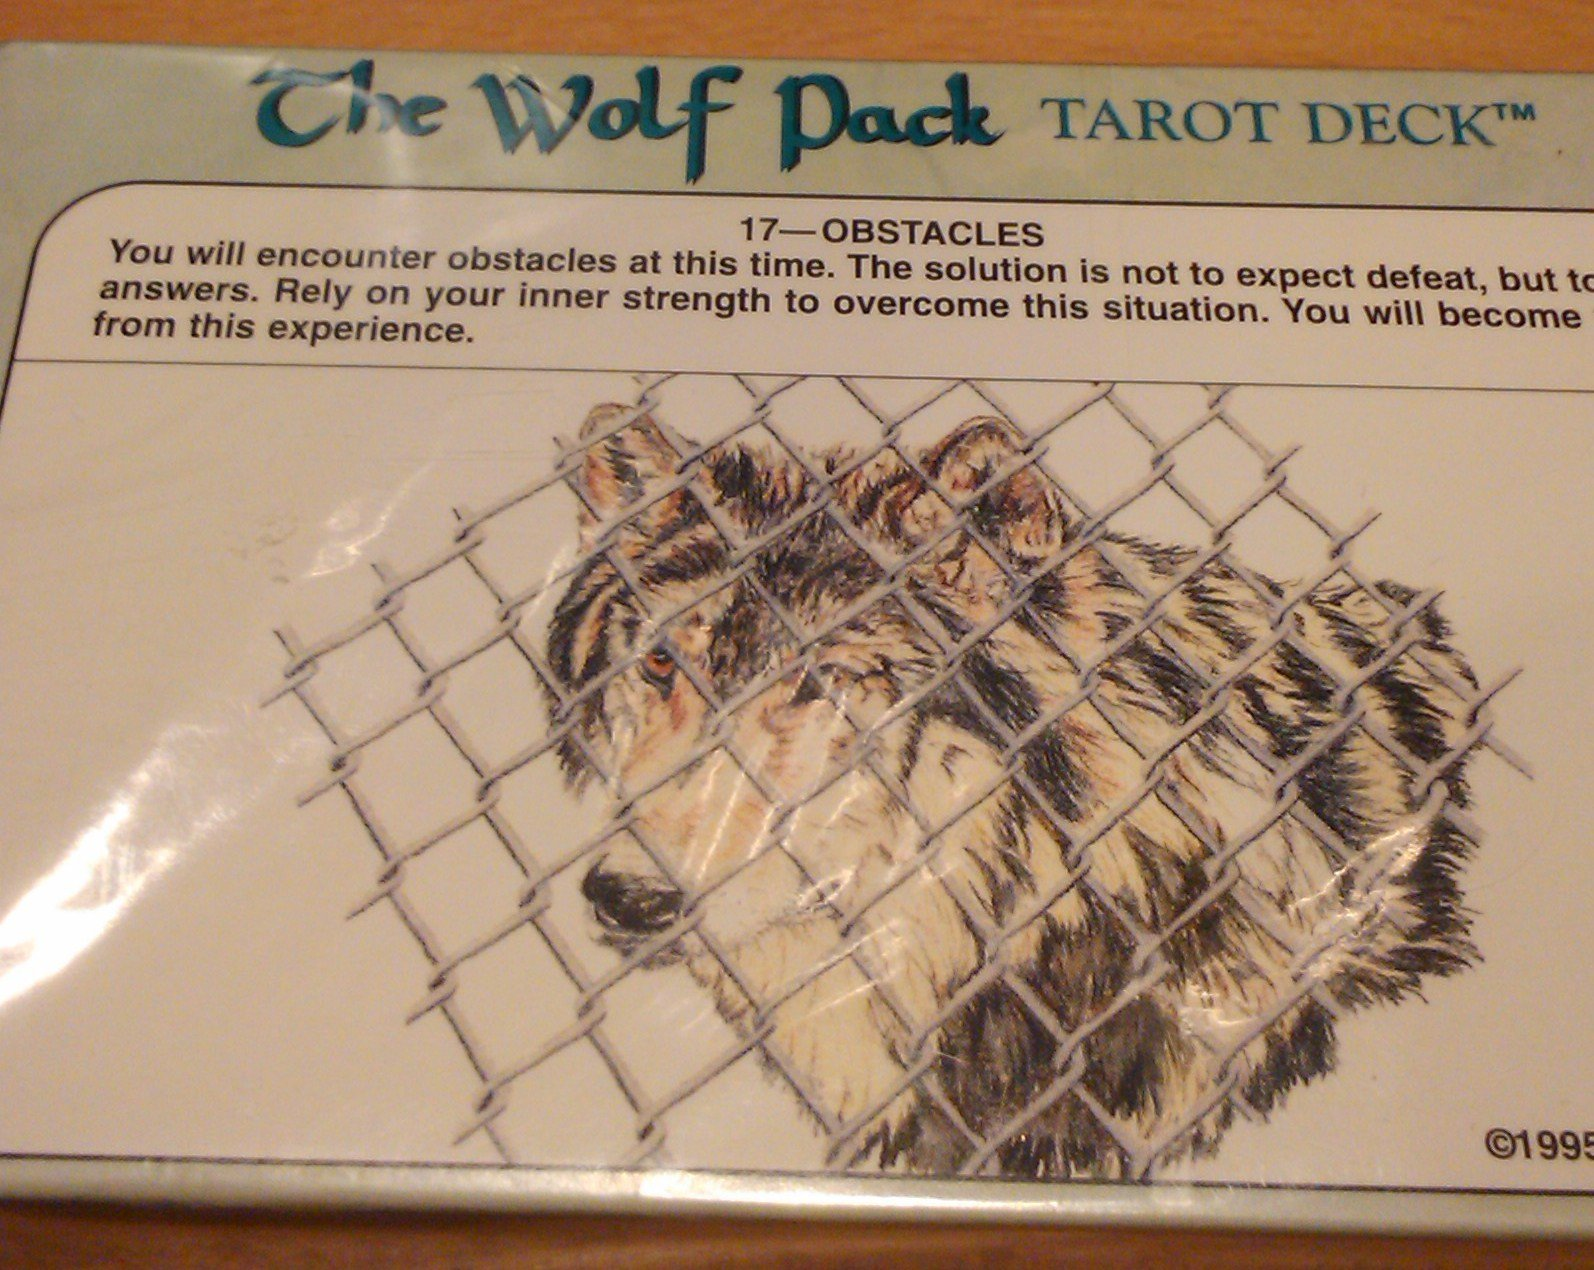 The Wolf Pack Tarot Deck: Amazon.es: Robert Petro: Libros